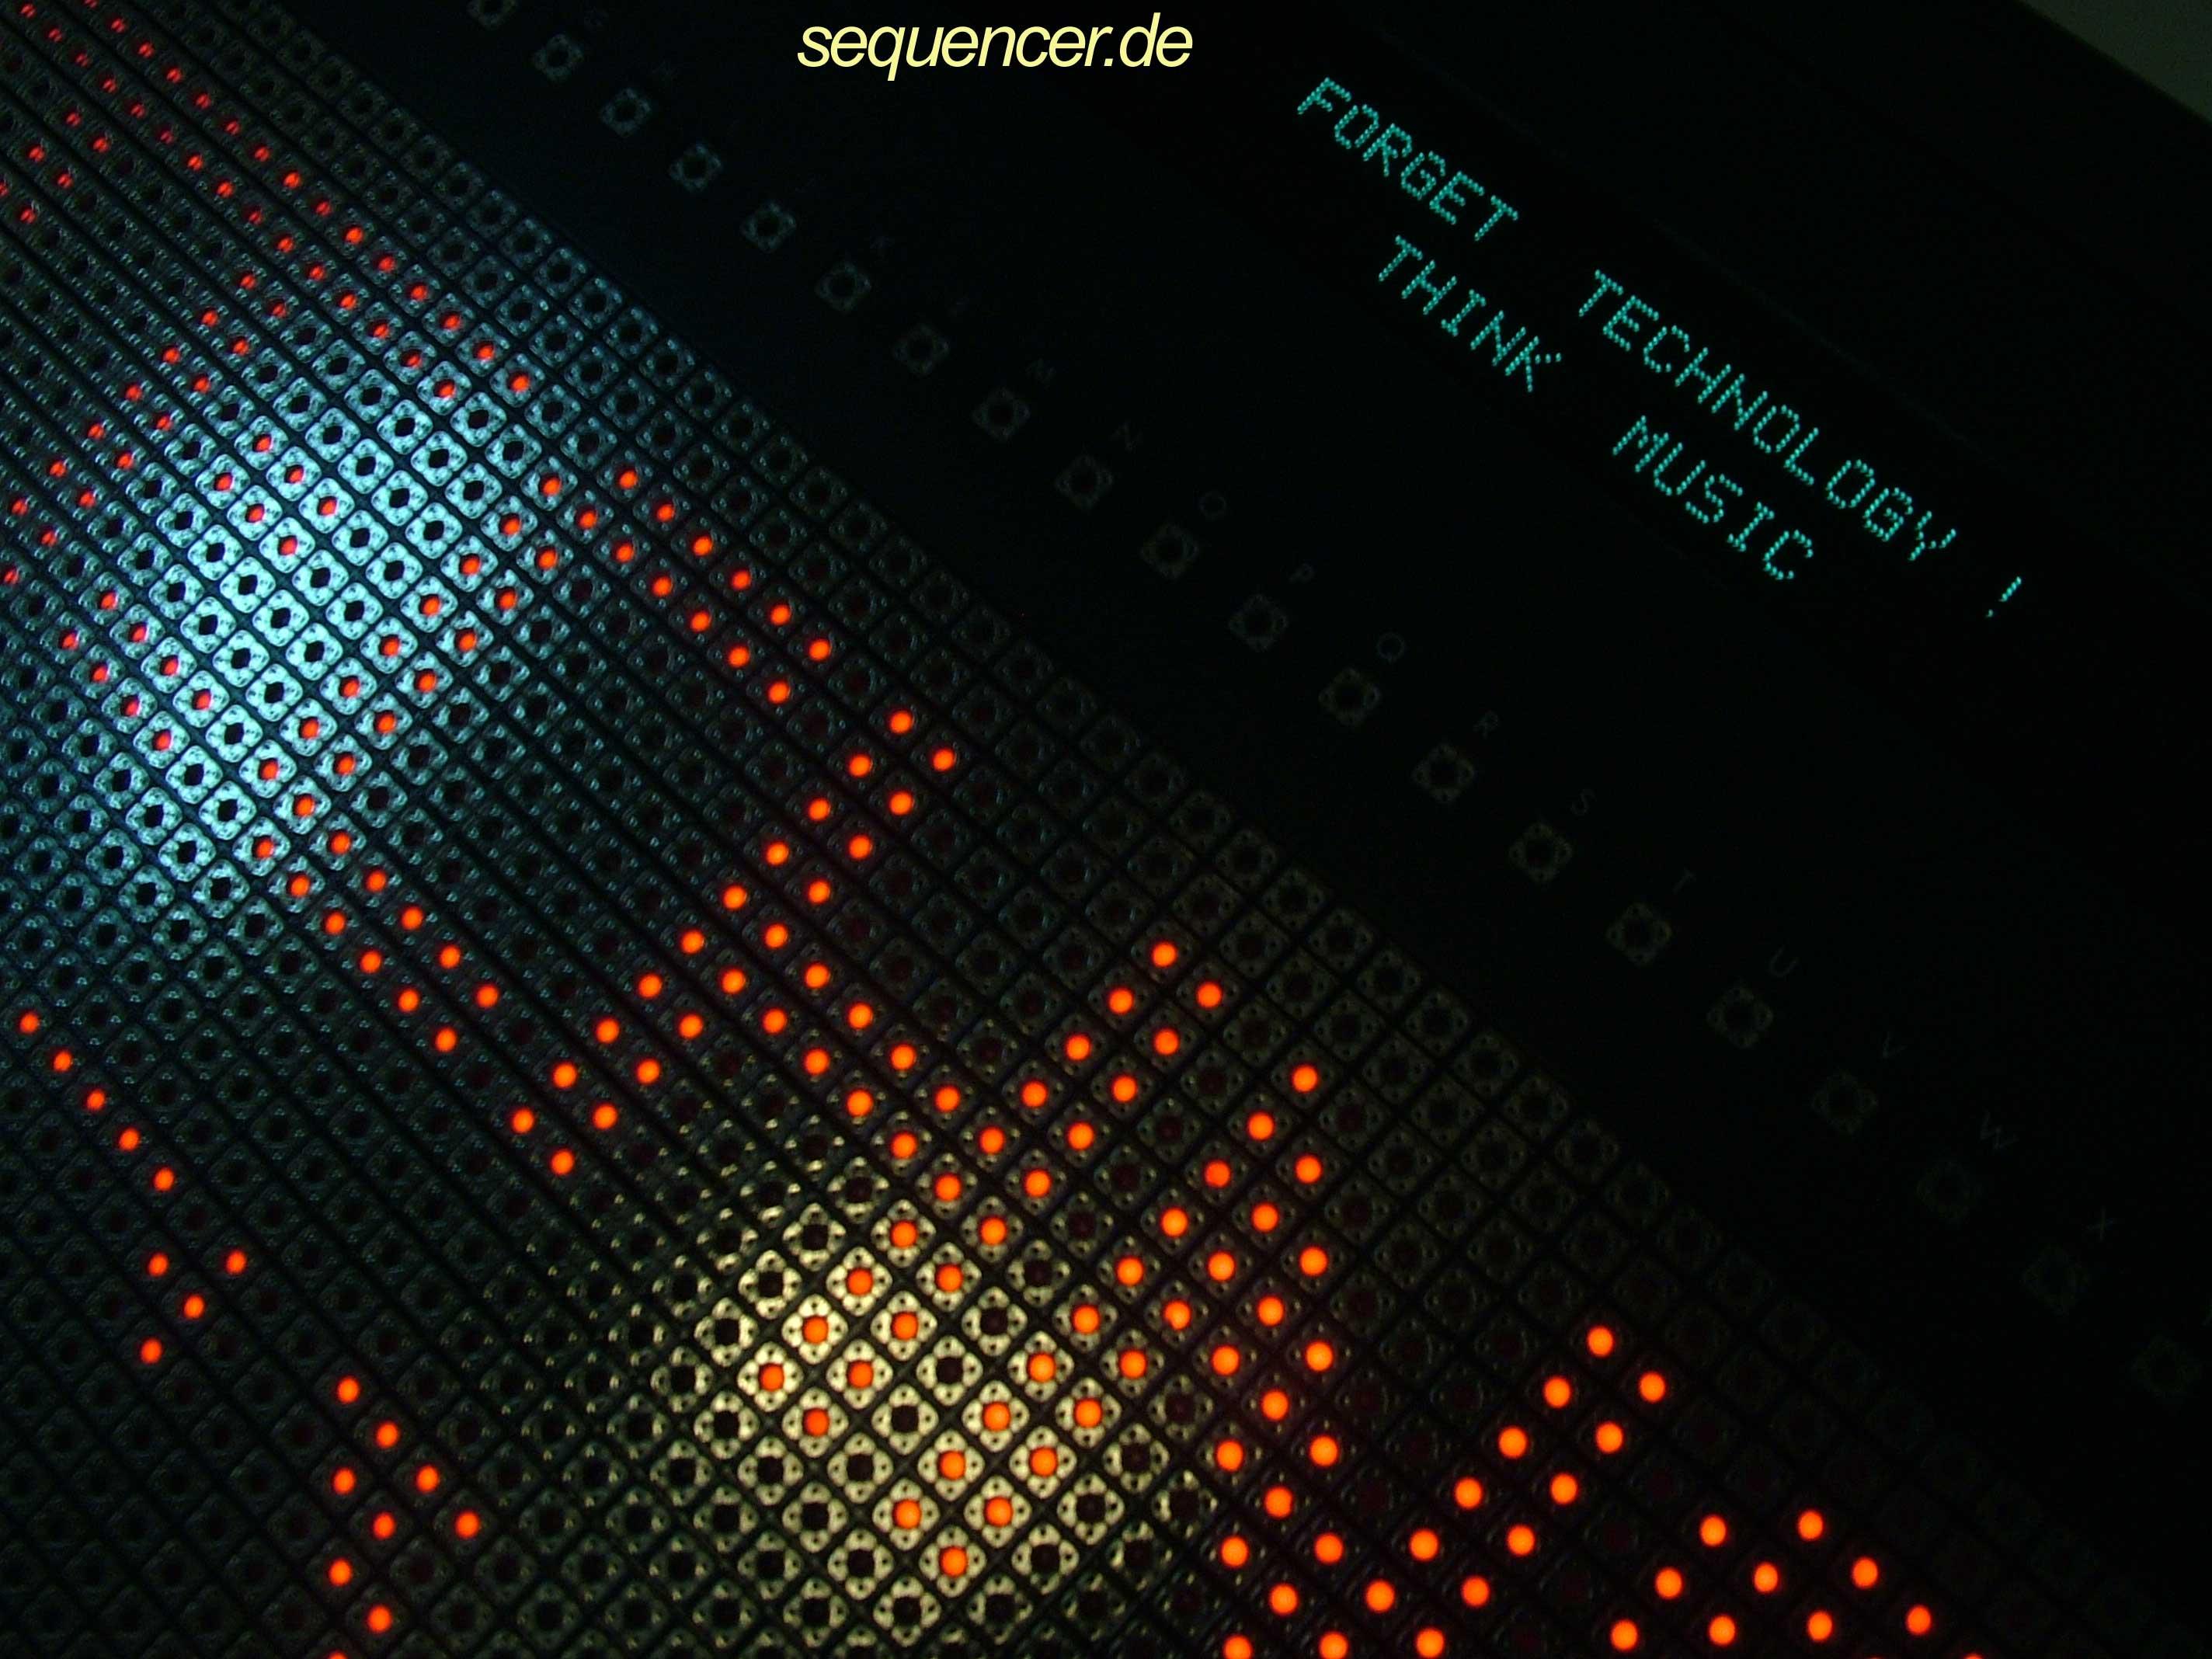 Technos Acxel System Technos Acxel System synthesizer